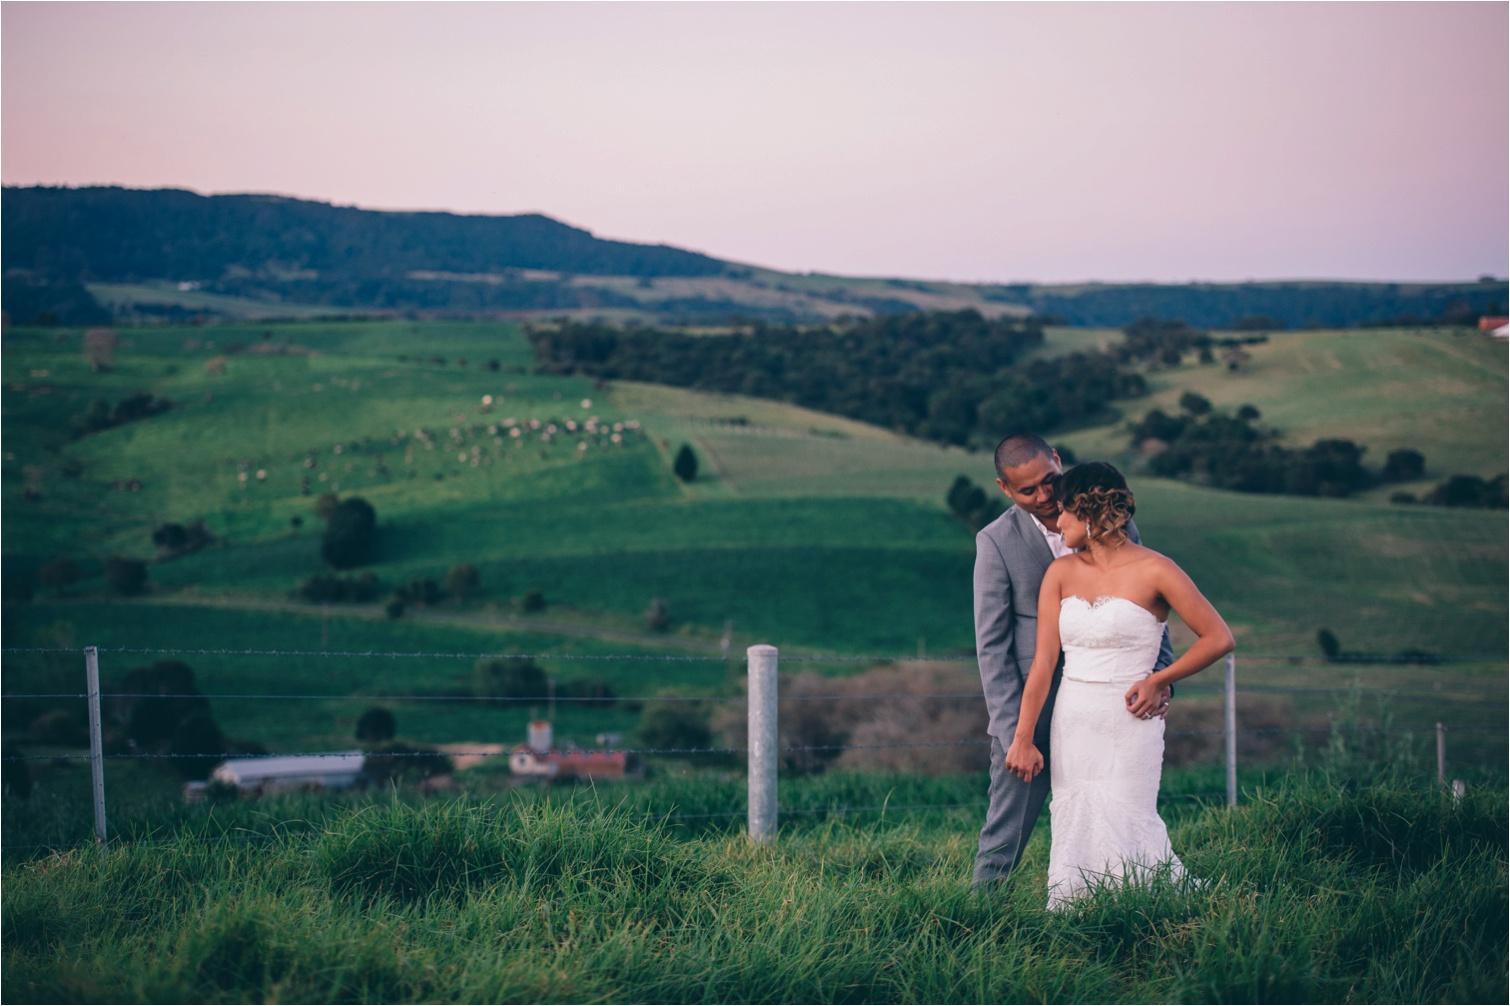 Gerrigong_Beach_Winery_Wedding-by_The_Follans_0055.jpg